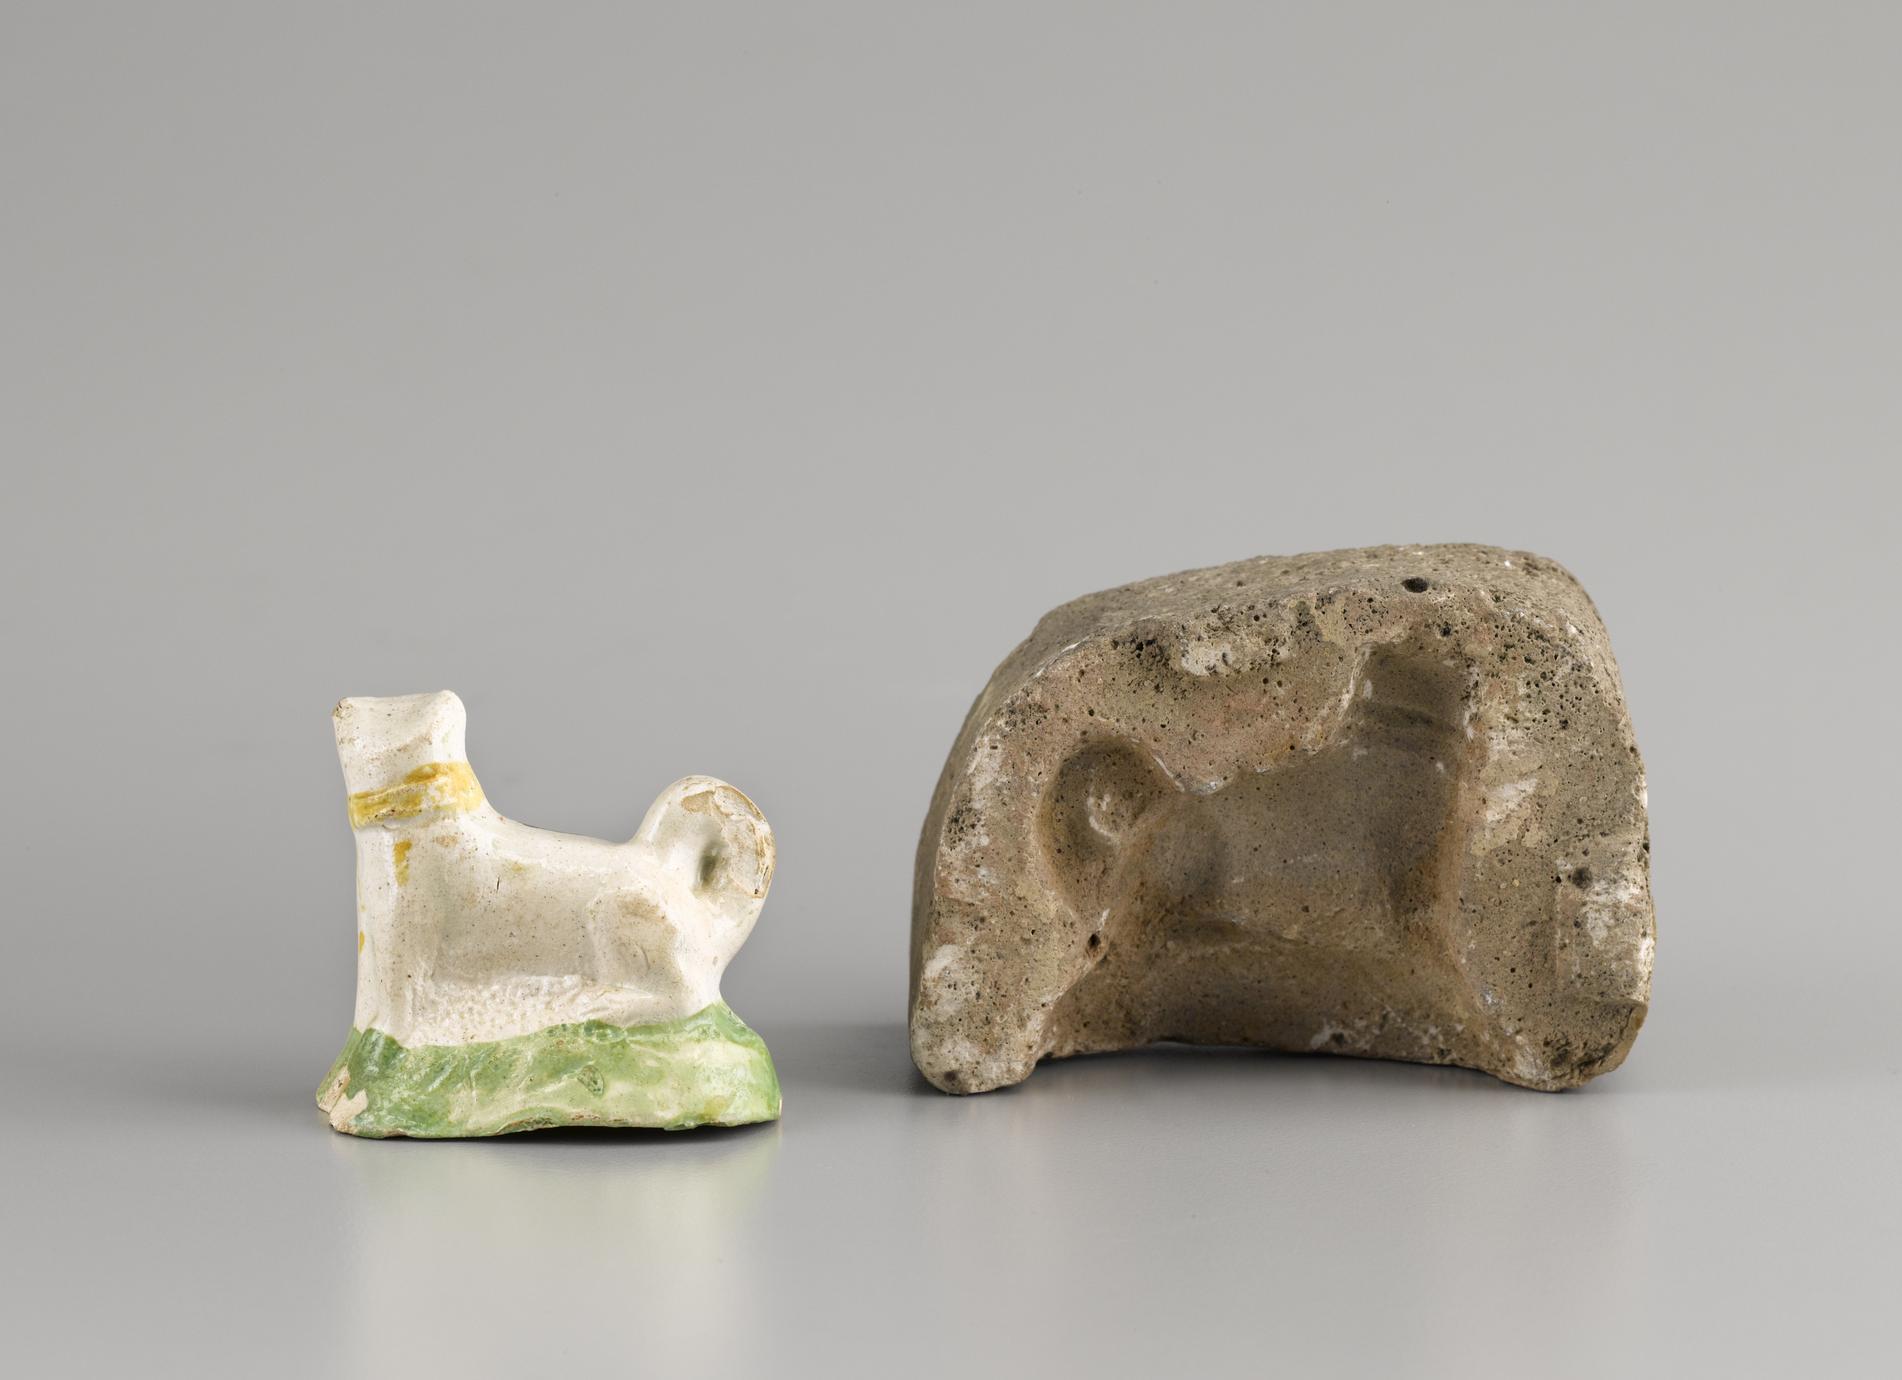 Dog mold (1 of 2)